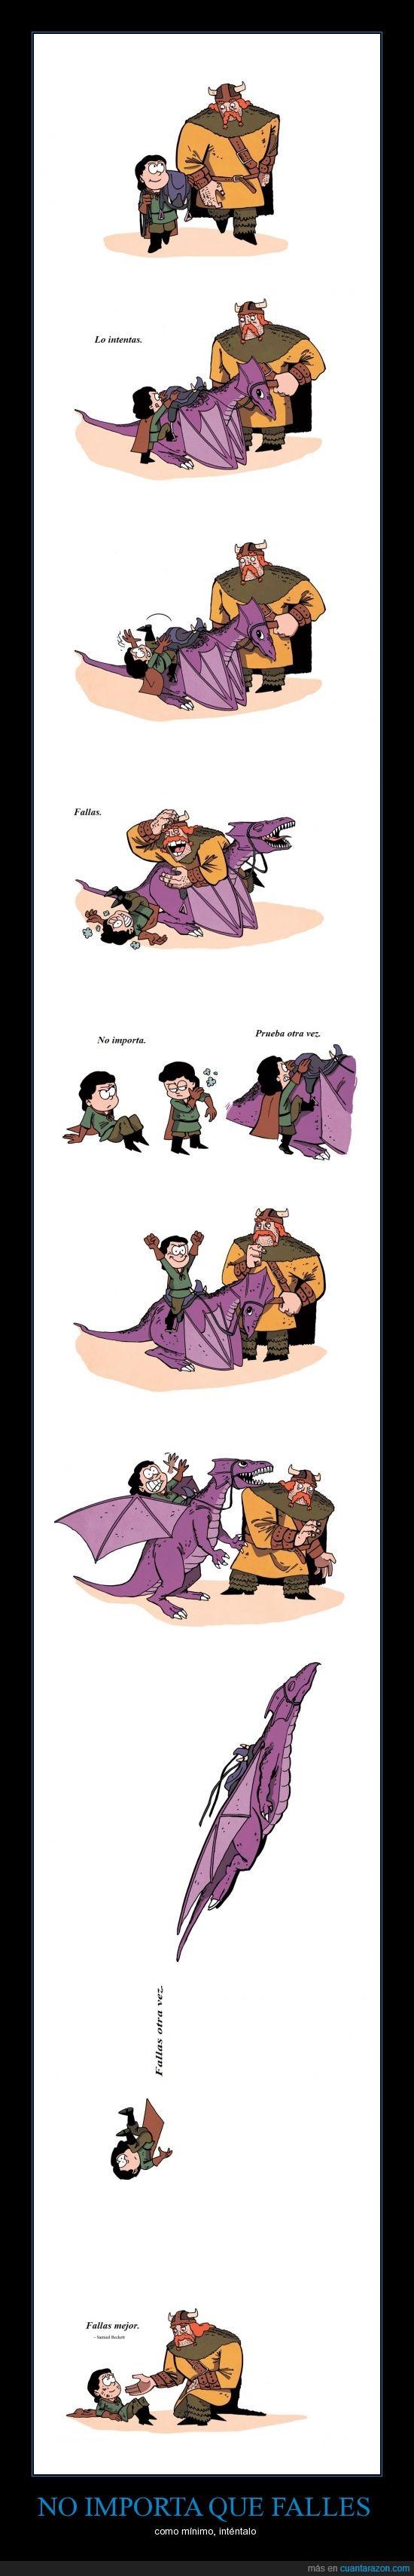 caer,dragon,fallar,mejor,nordico,vikingo